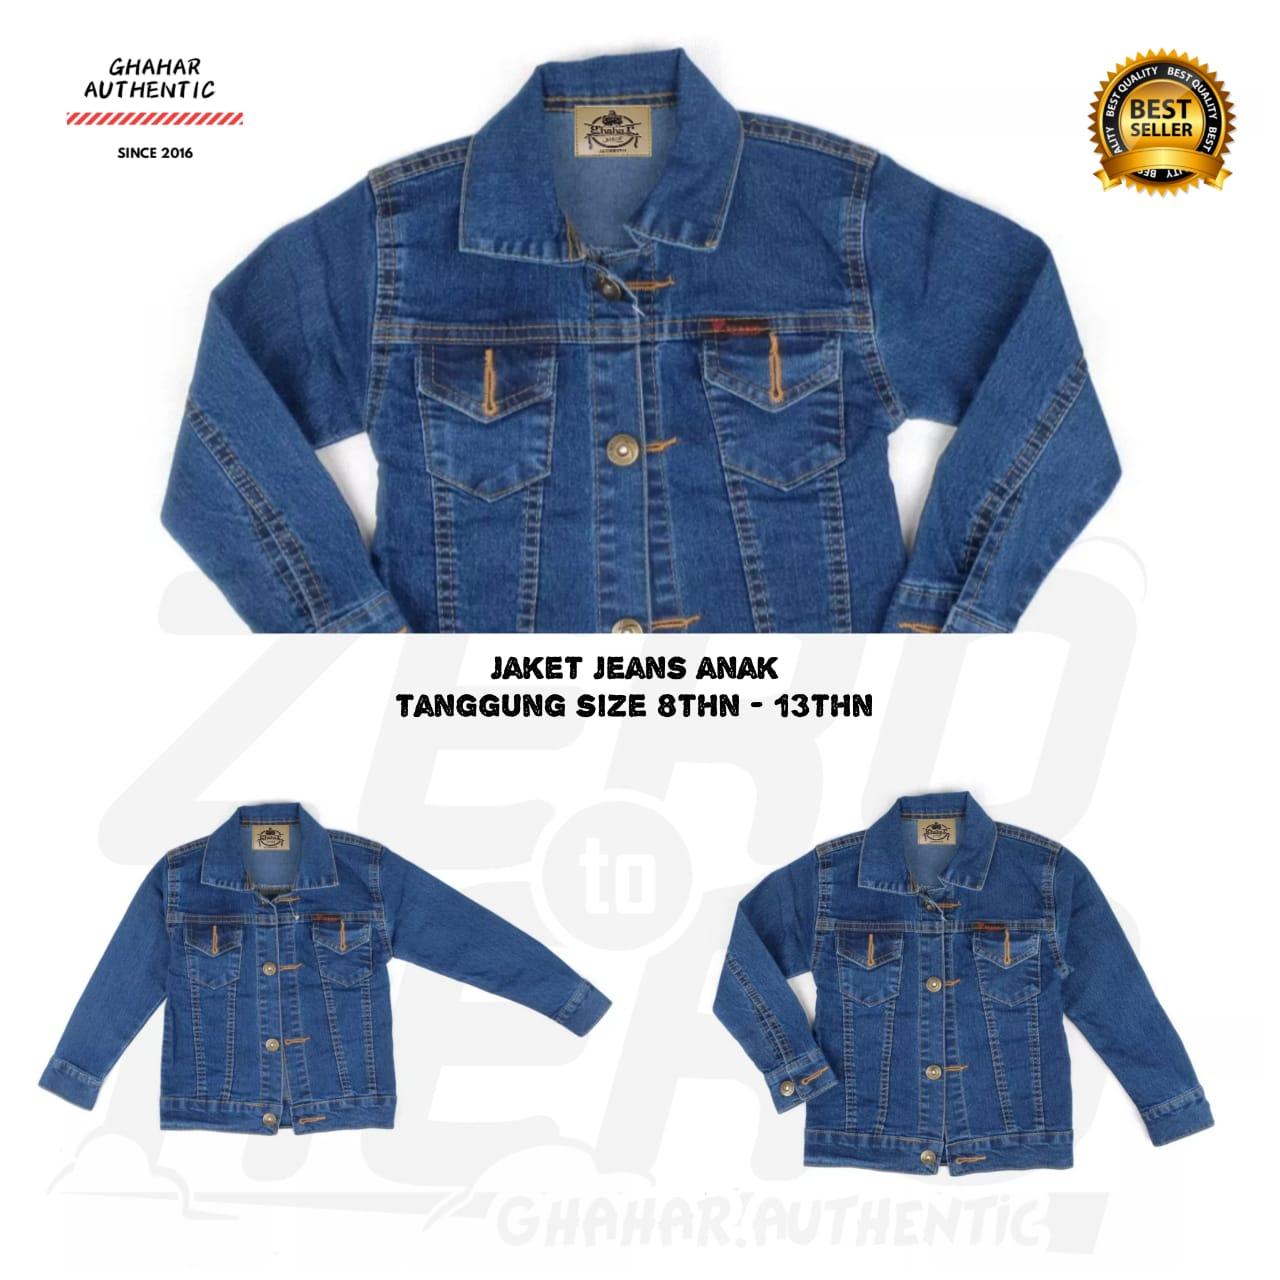 gn -jaket jeans anak pria umur 8thn-13thn / jaket jeans ghahar anak tanggung biowash